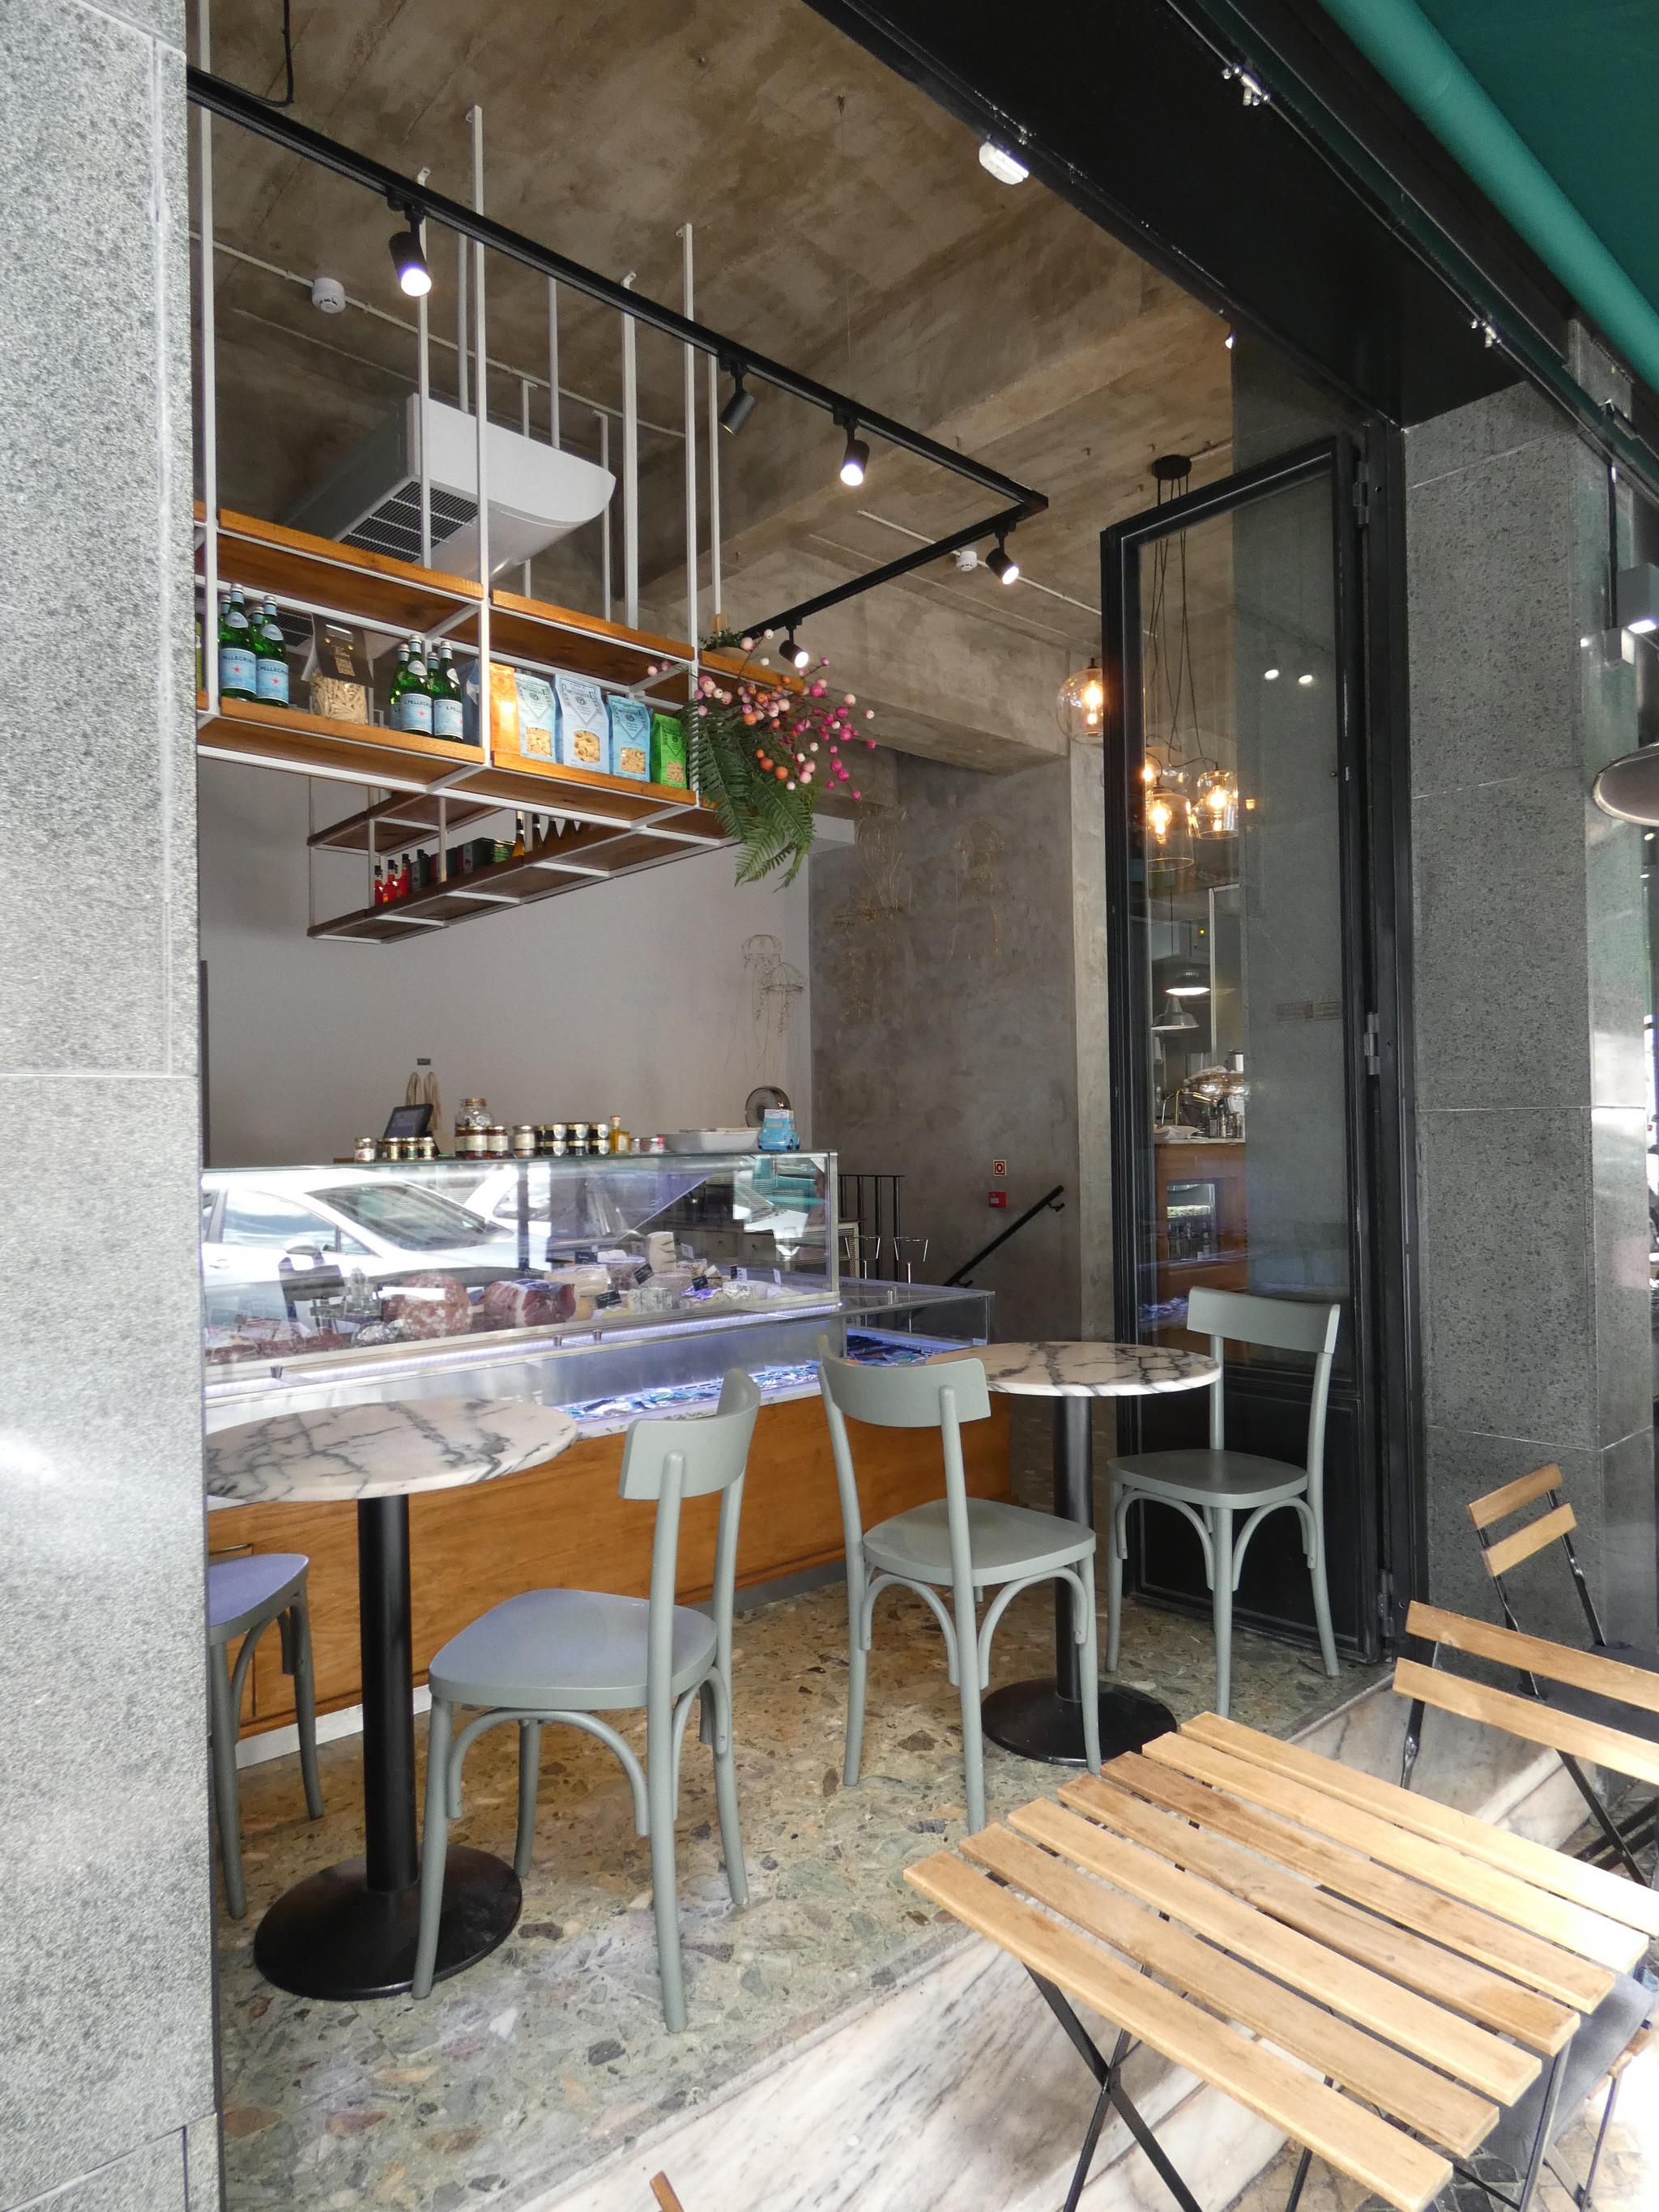 Restaurante La Fiammetta P1000164.JPG